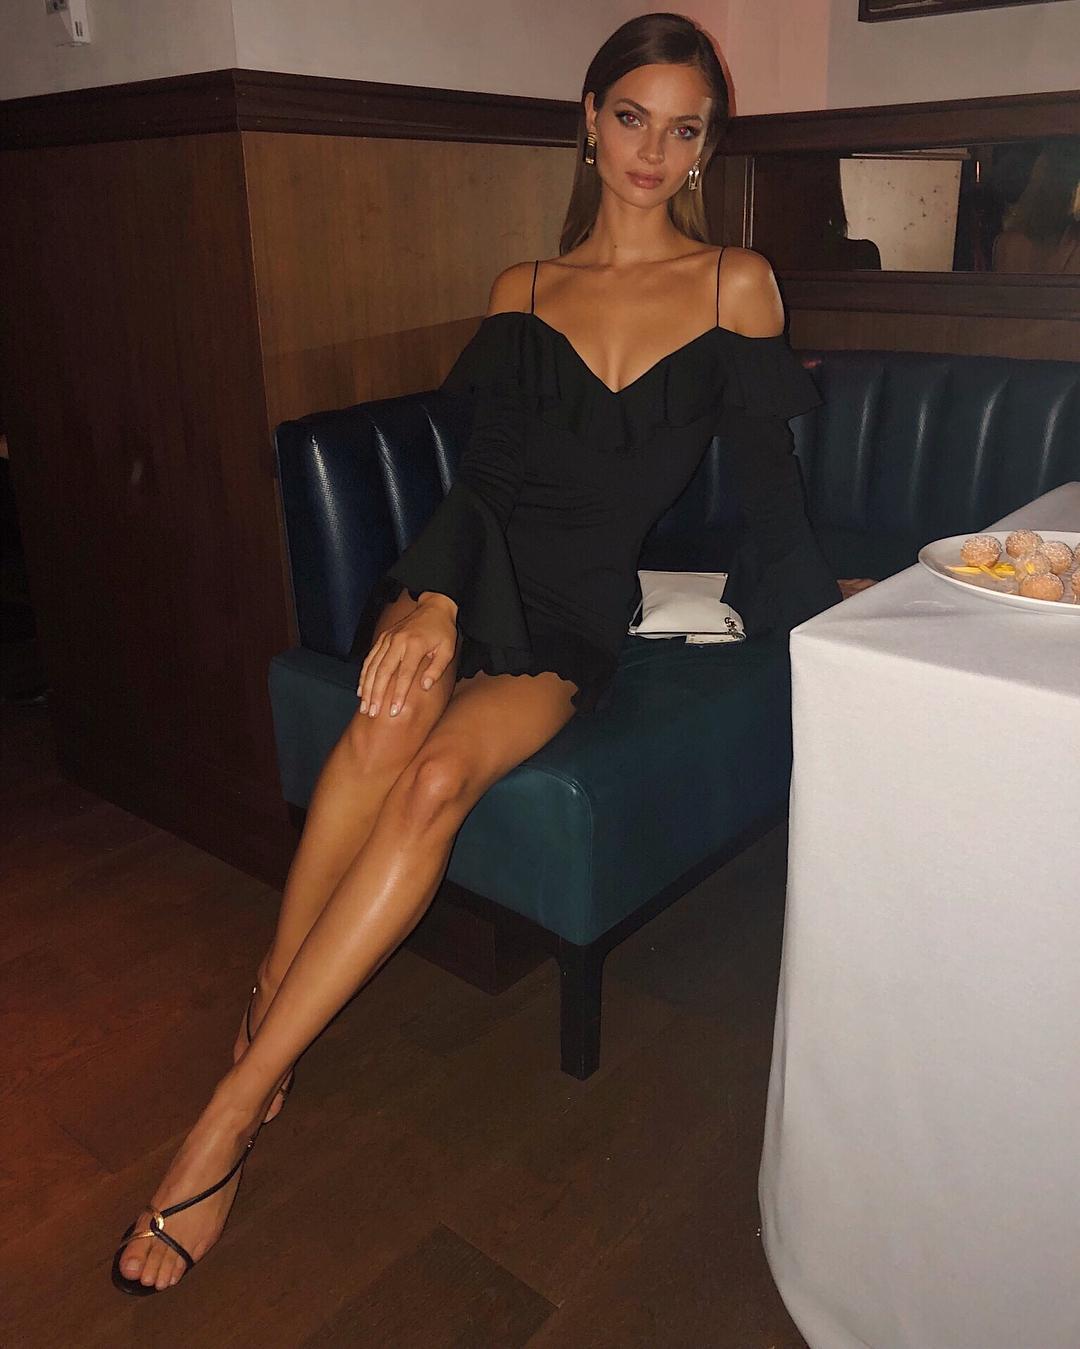 Feet Moa Aberg nude (48 photo), Sexy, Bikini, Boobs, cleavage 2020